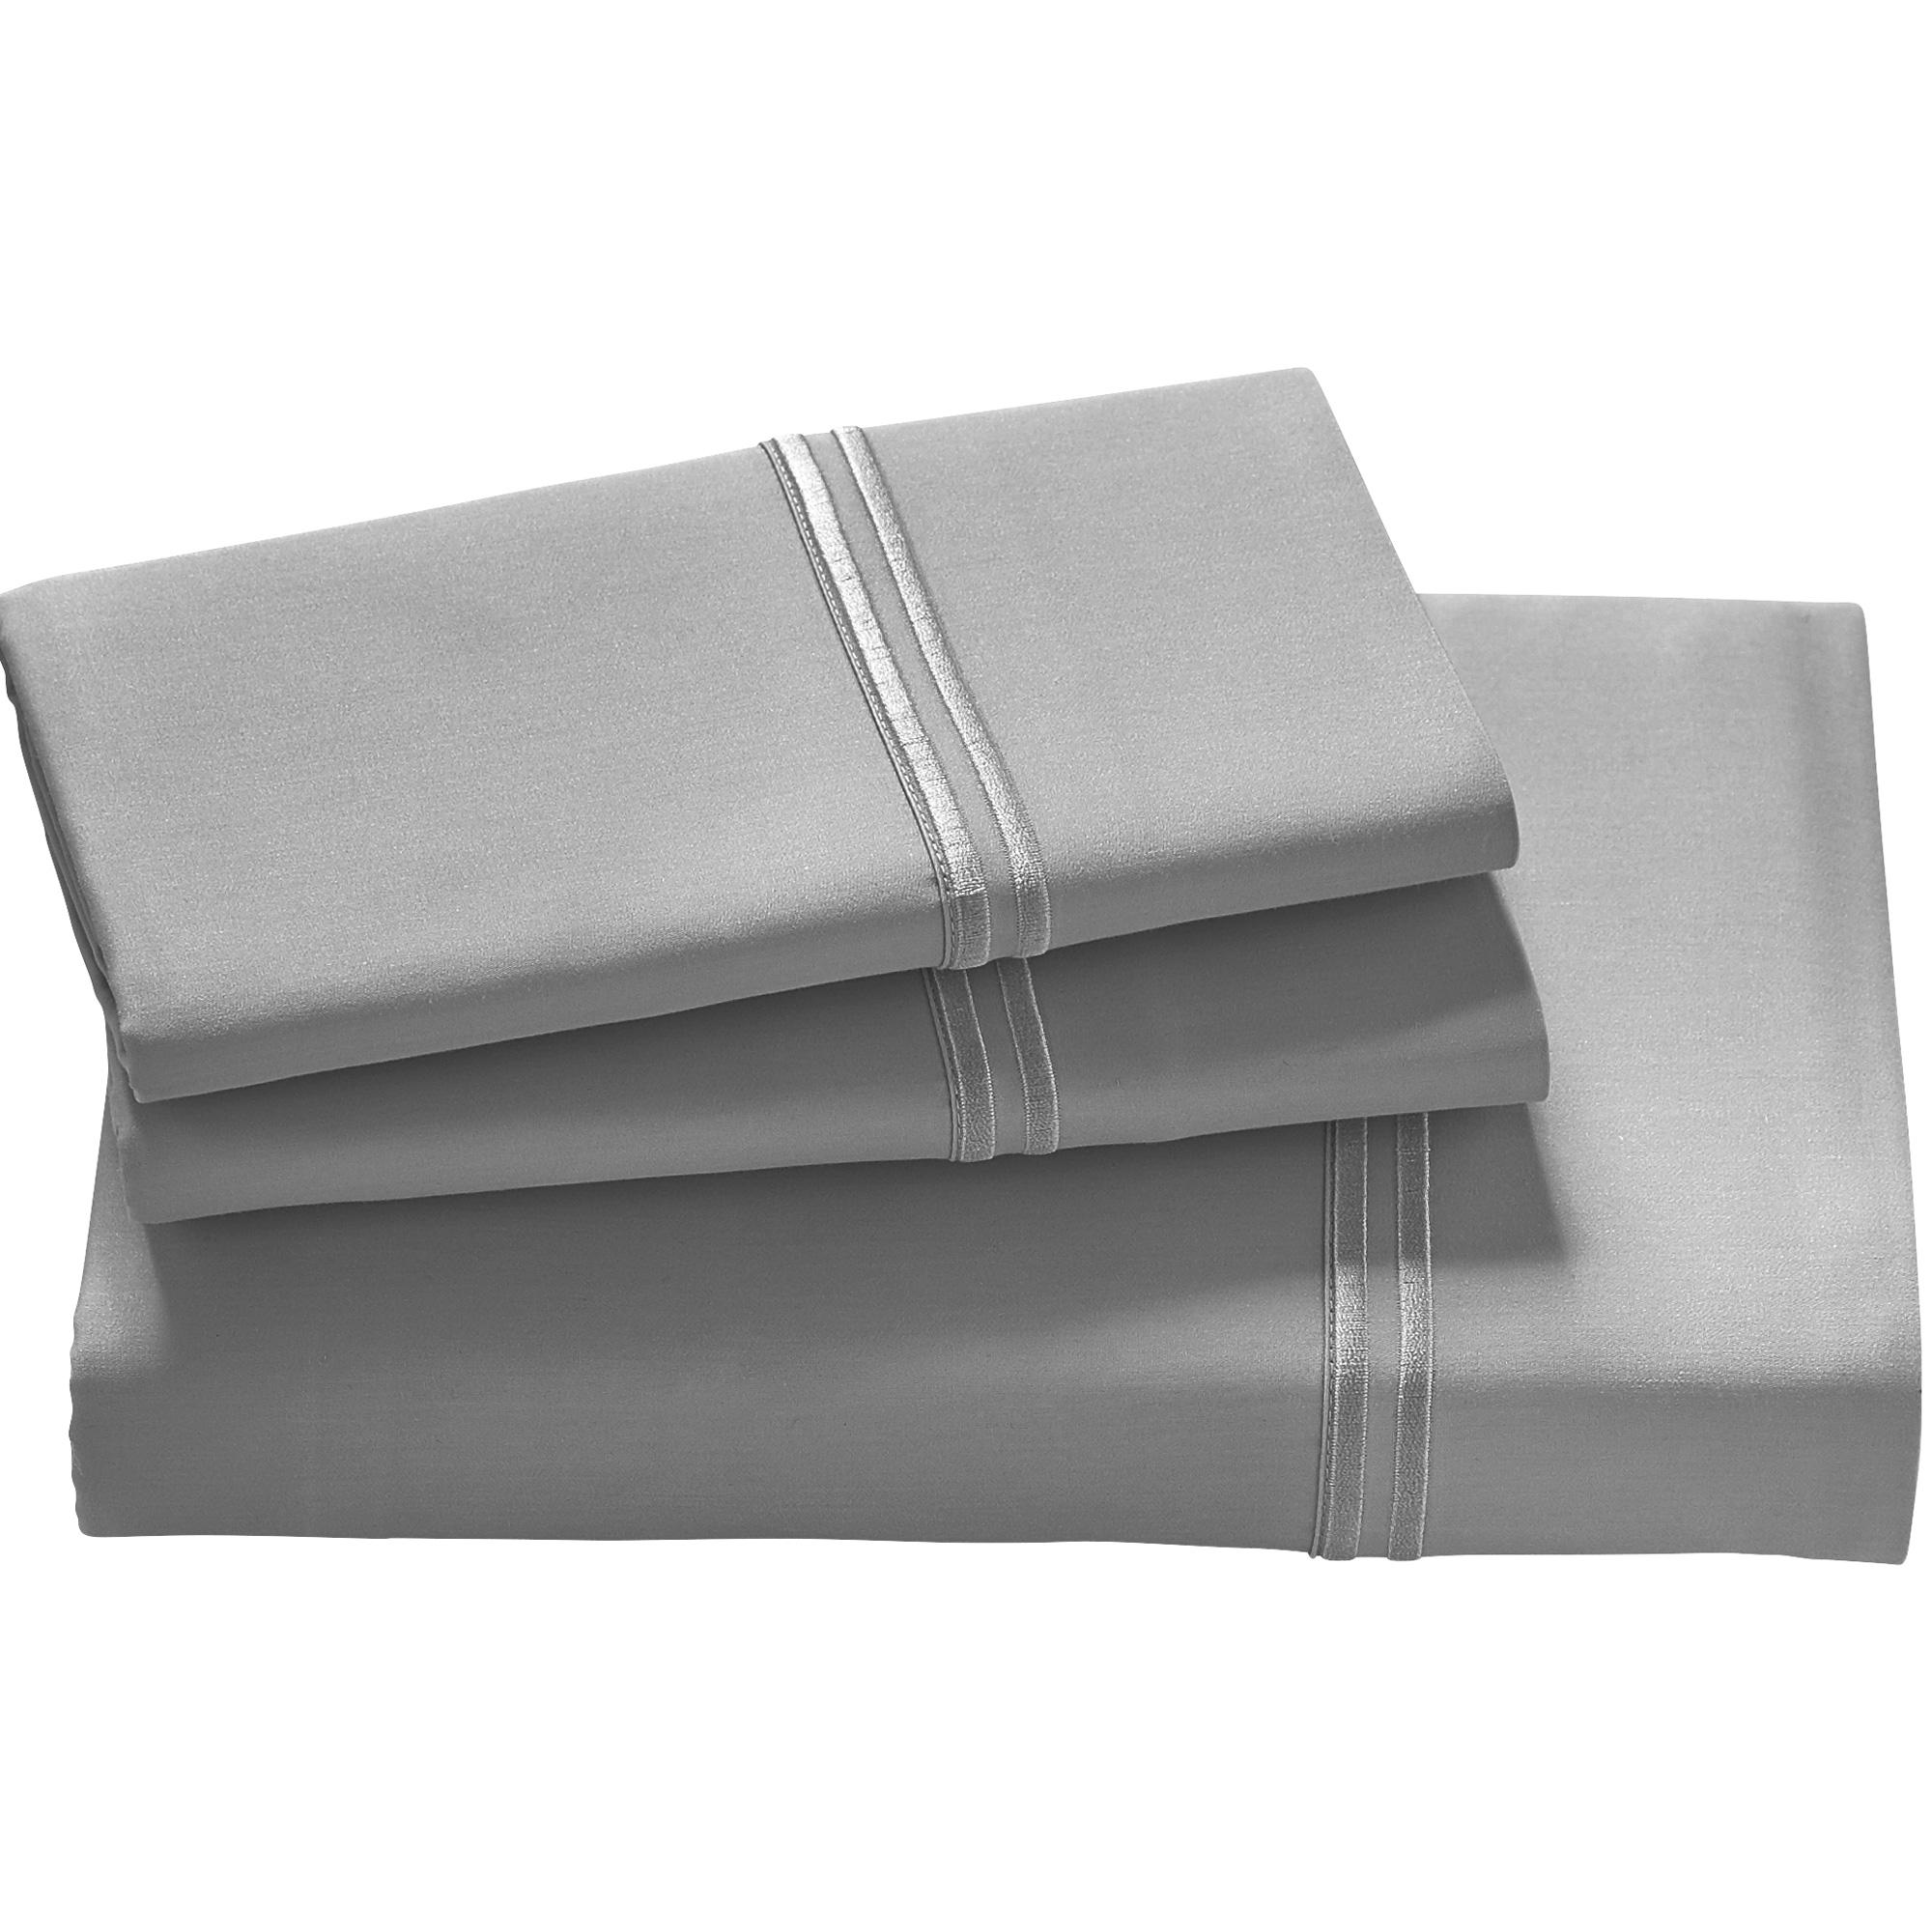 Purecare | Elements Dove Gray Queen Tencel Sheet Set